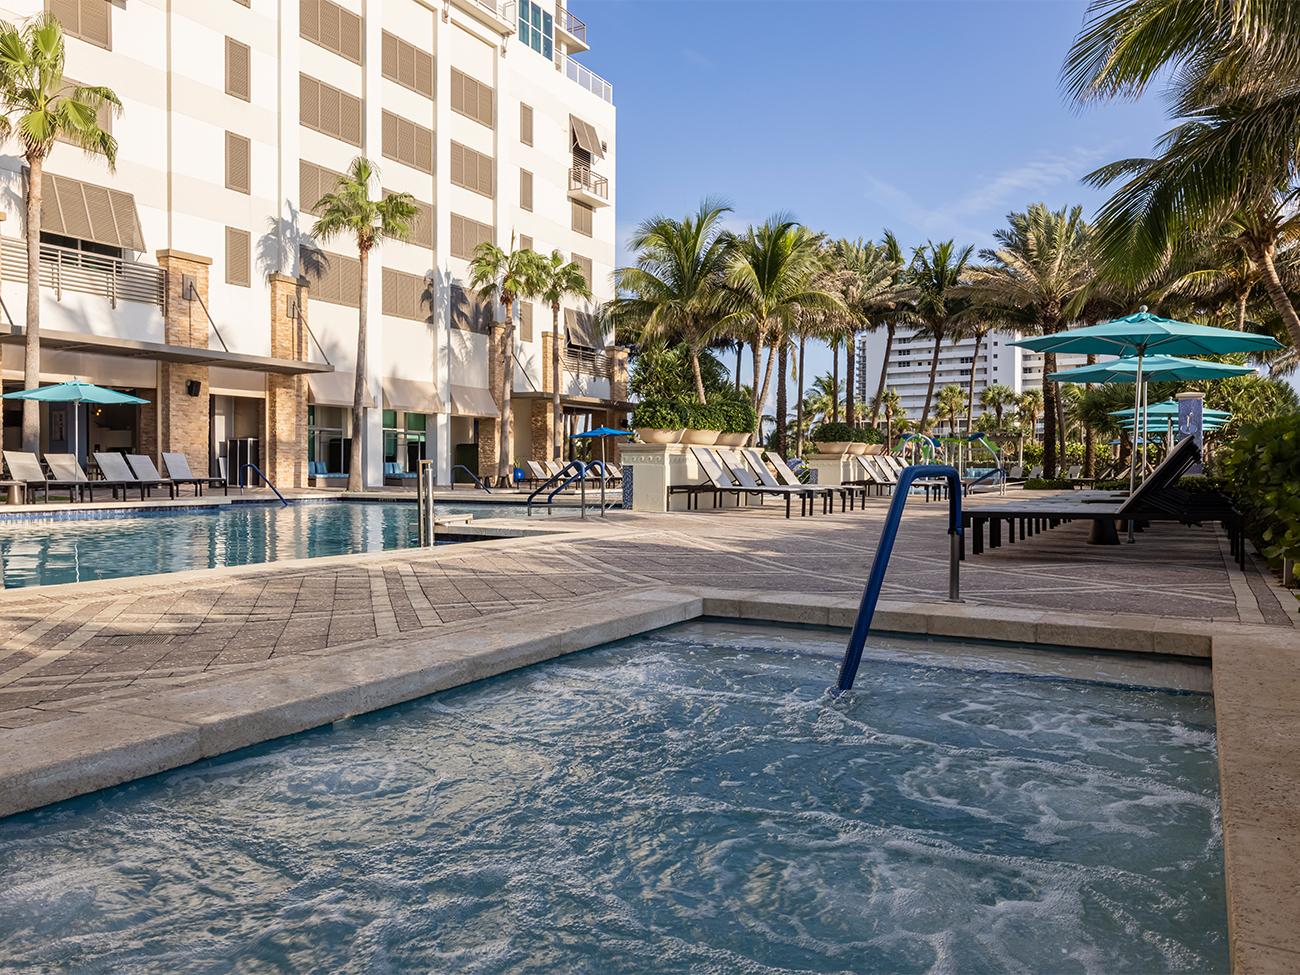 Marriott's Oceana Palms Whirlpool Spa. Marriott's Oceana Palms is located in Riviera Beach, Florida United States.